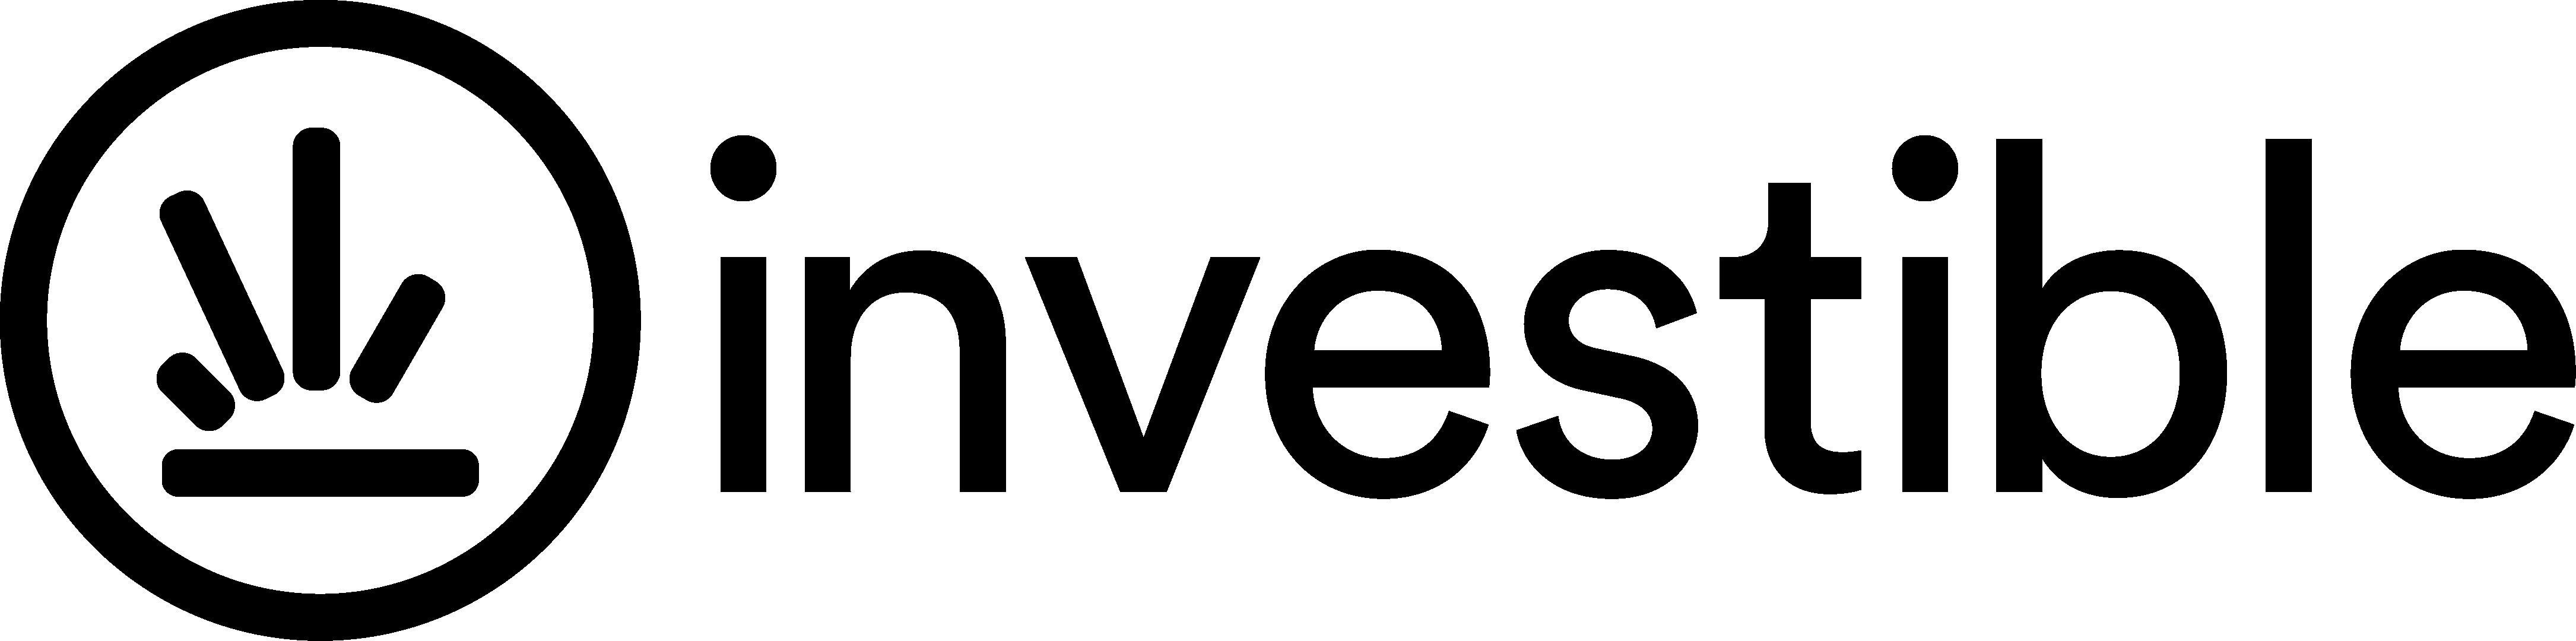 Investible logo